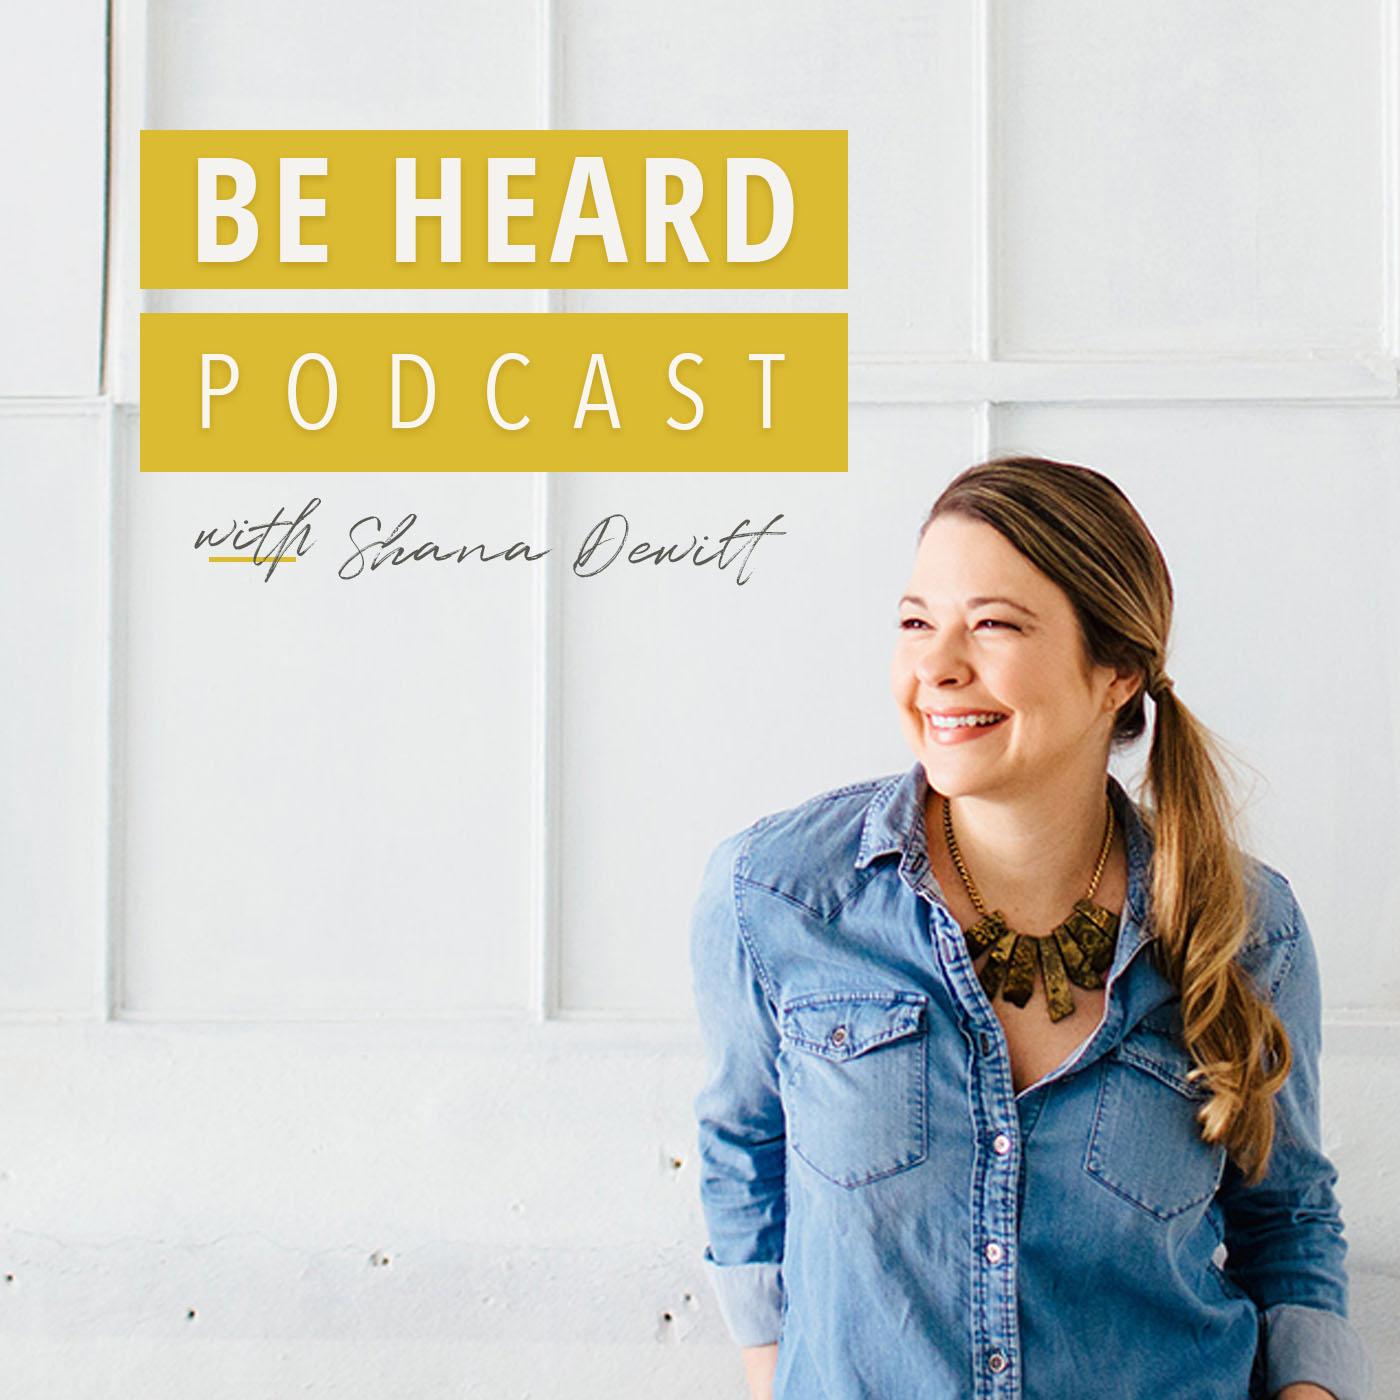 Be Heard Podcast show art